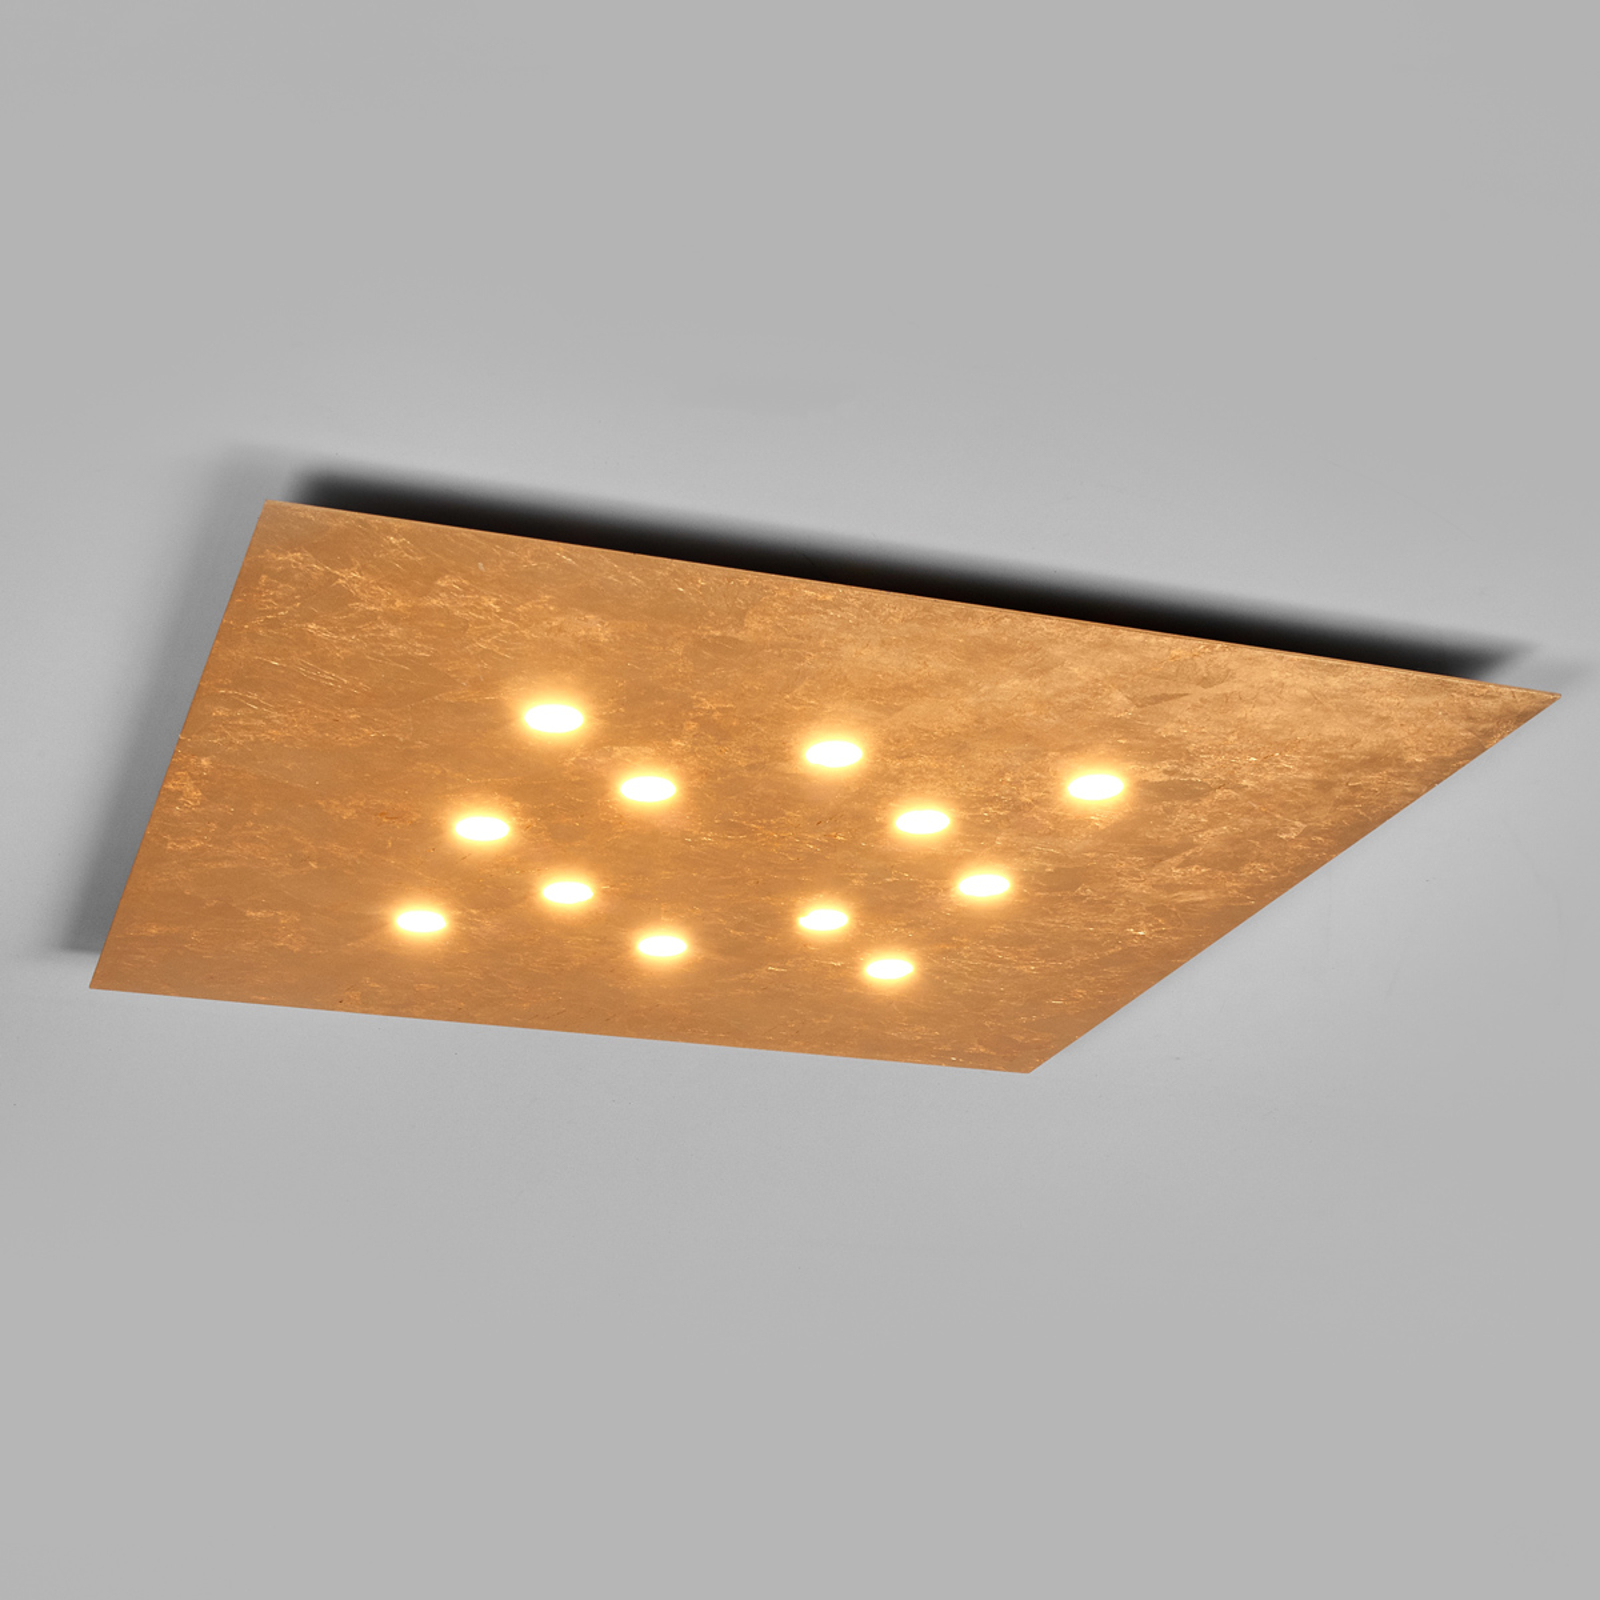 Platte led-plafondlamp Slim 12-li, bladgoud